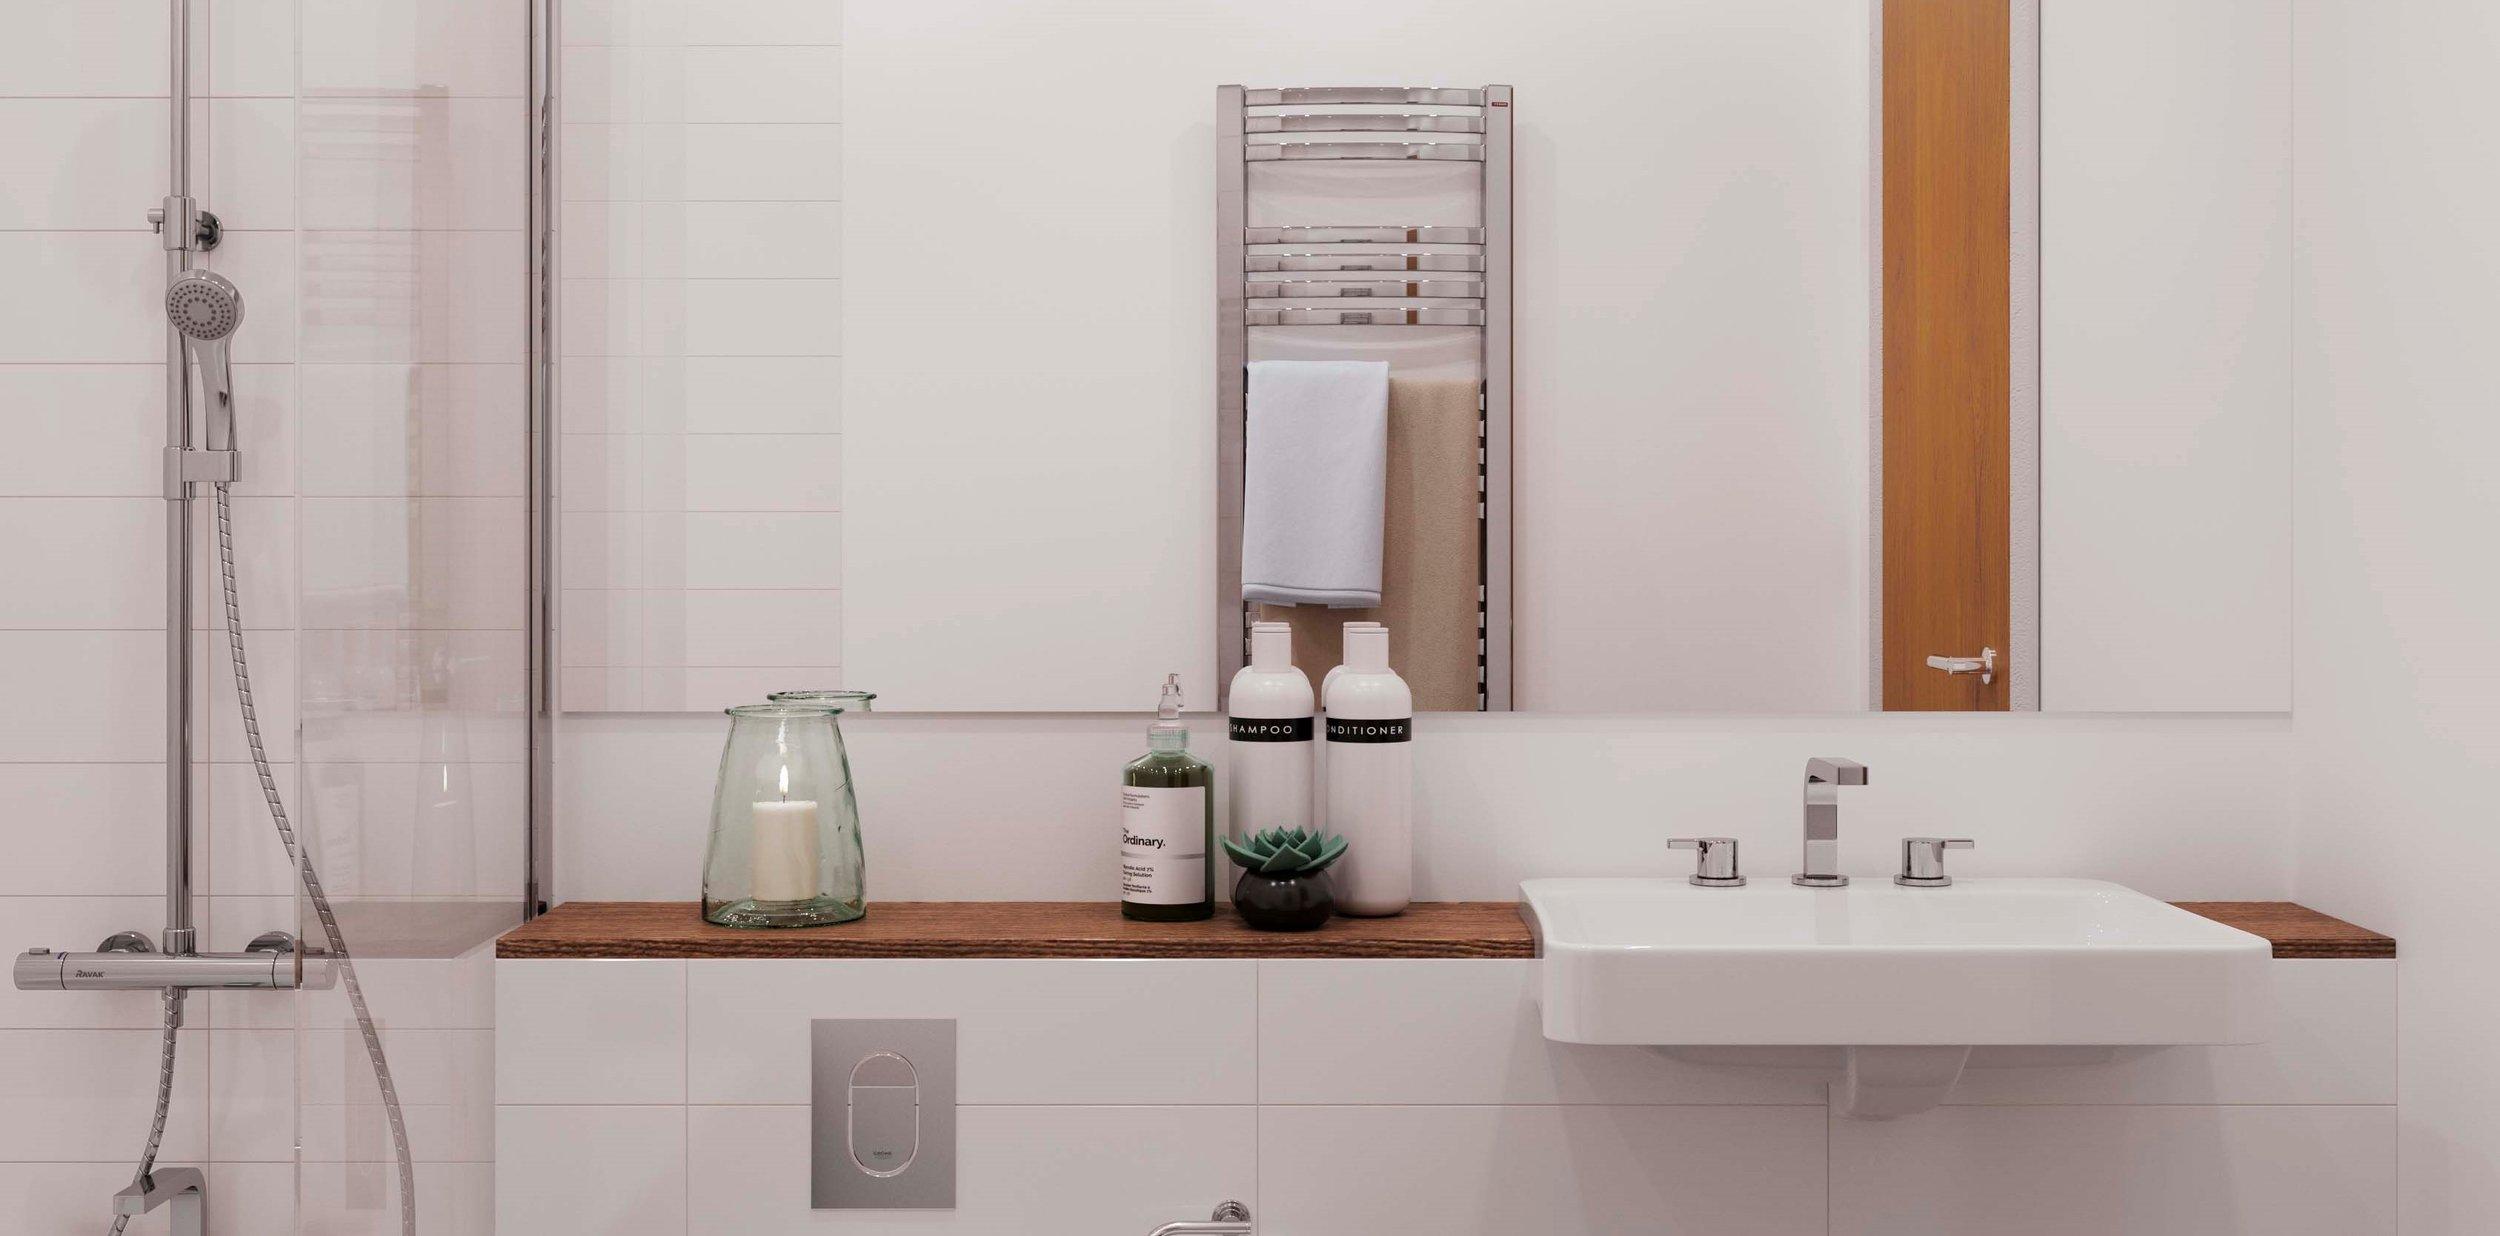 KBB - Bathroom Products CGI.jpg